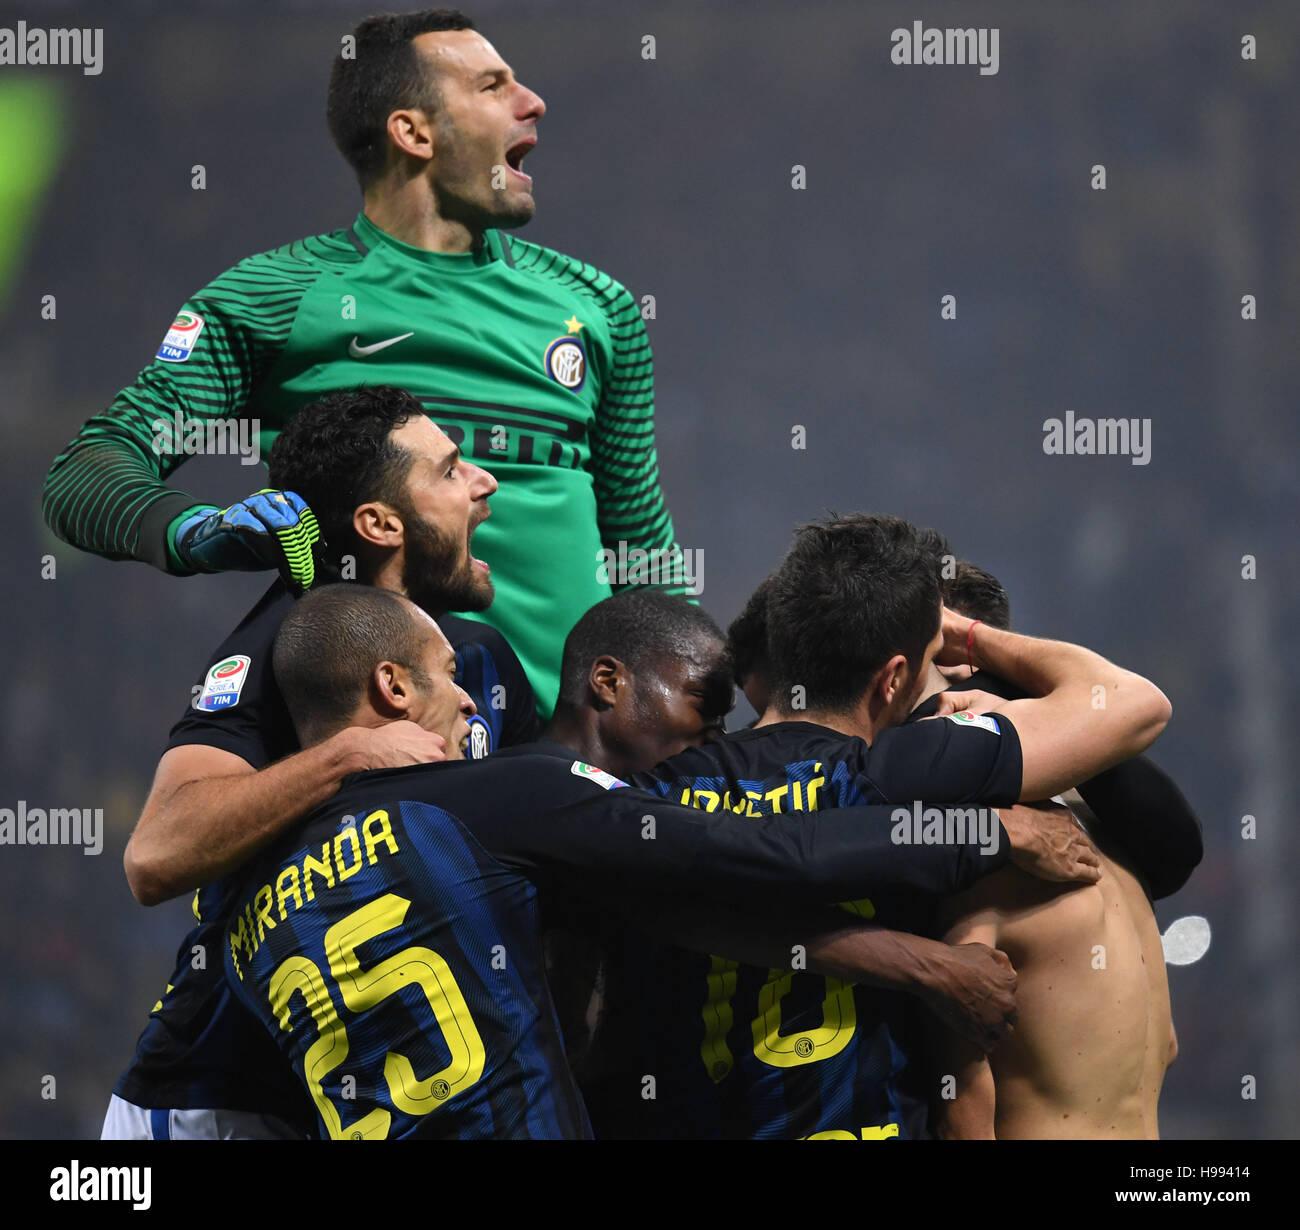 Milan. 20th Nov, 2016. Inter Milan's players celebrate Ivan Perisic's goal during the Italian Serie A football match Stock Photo